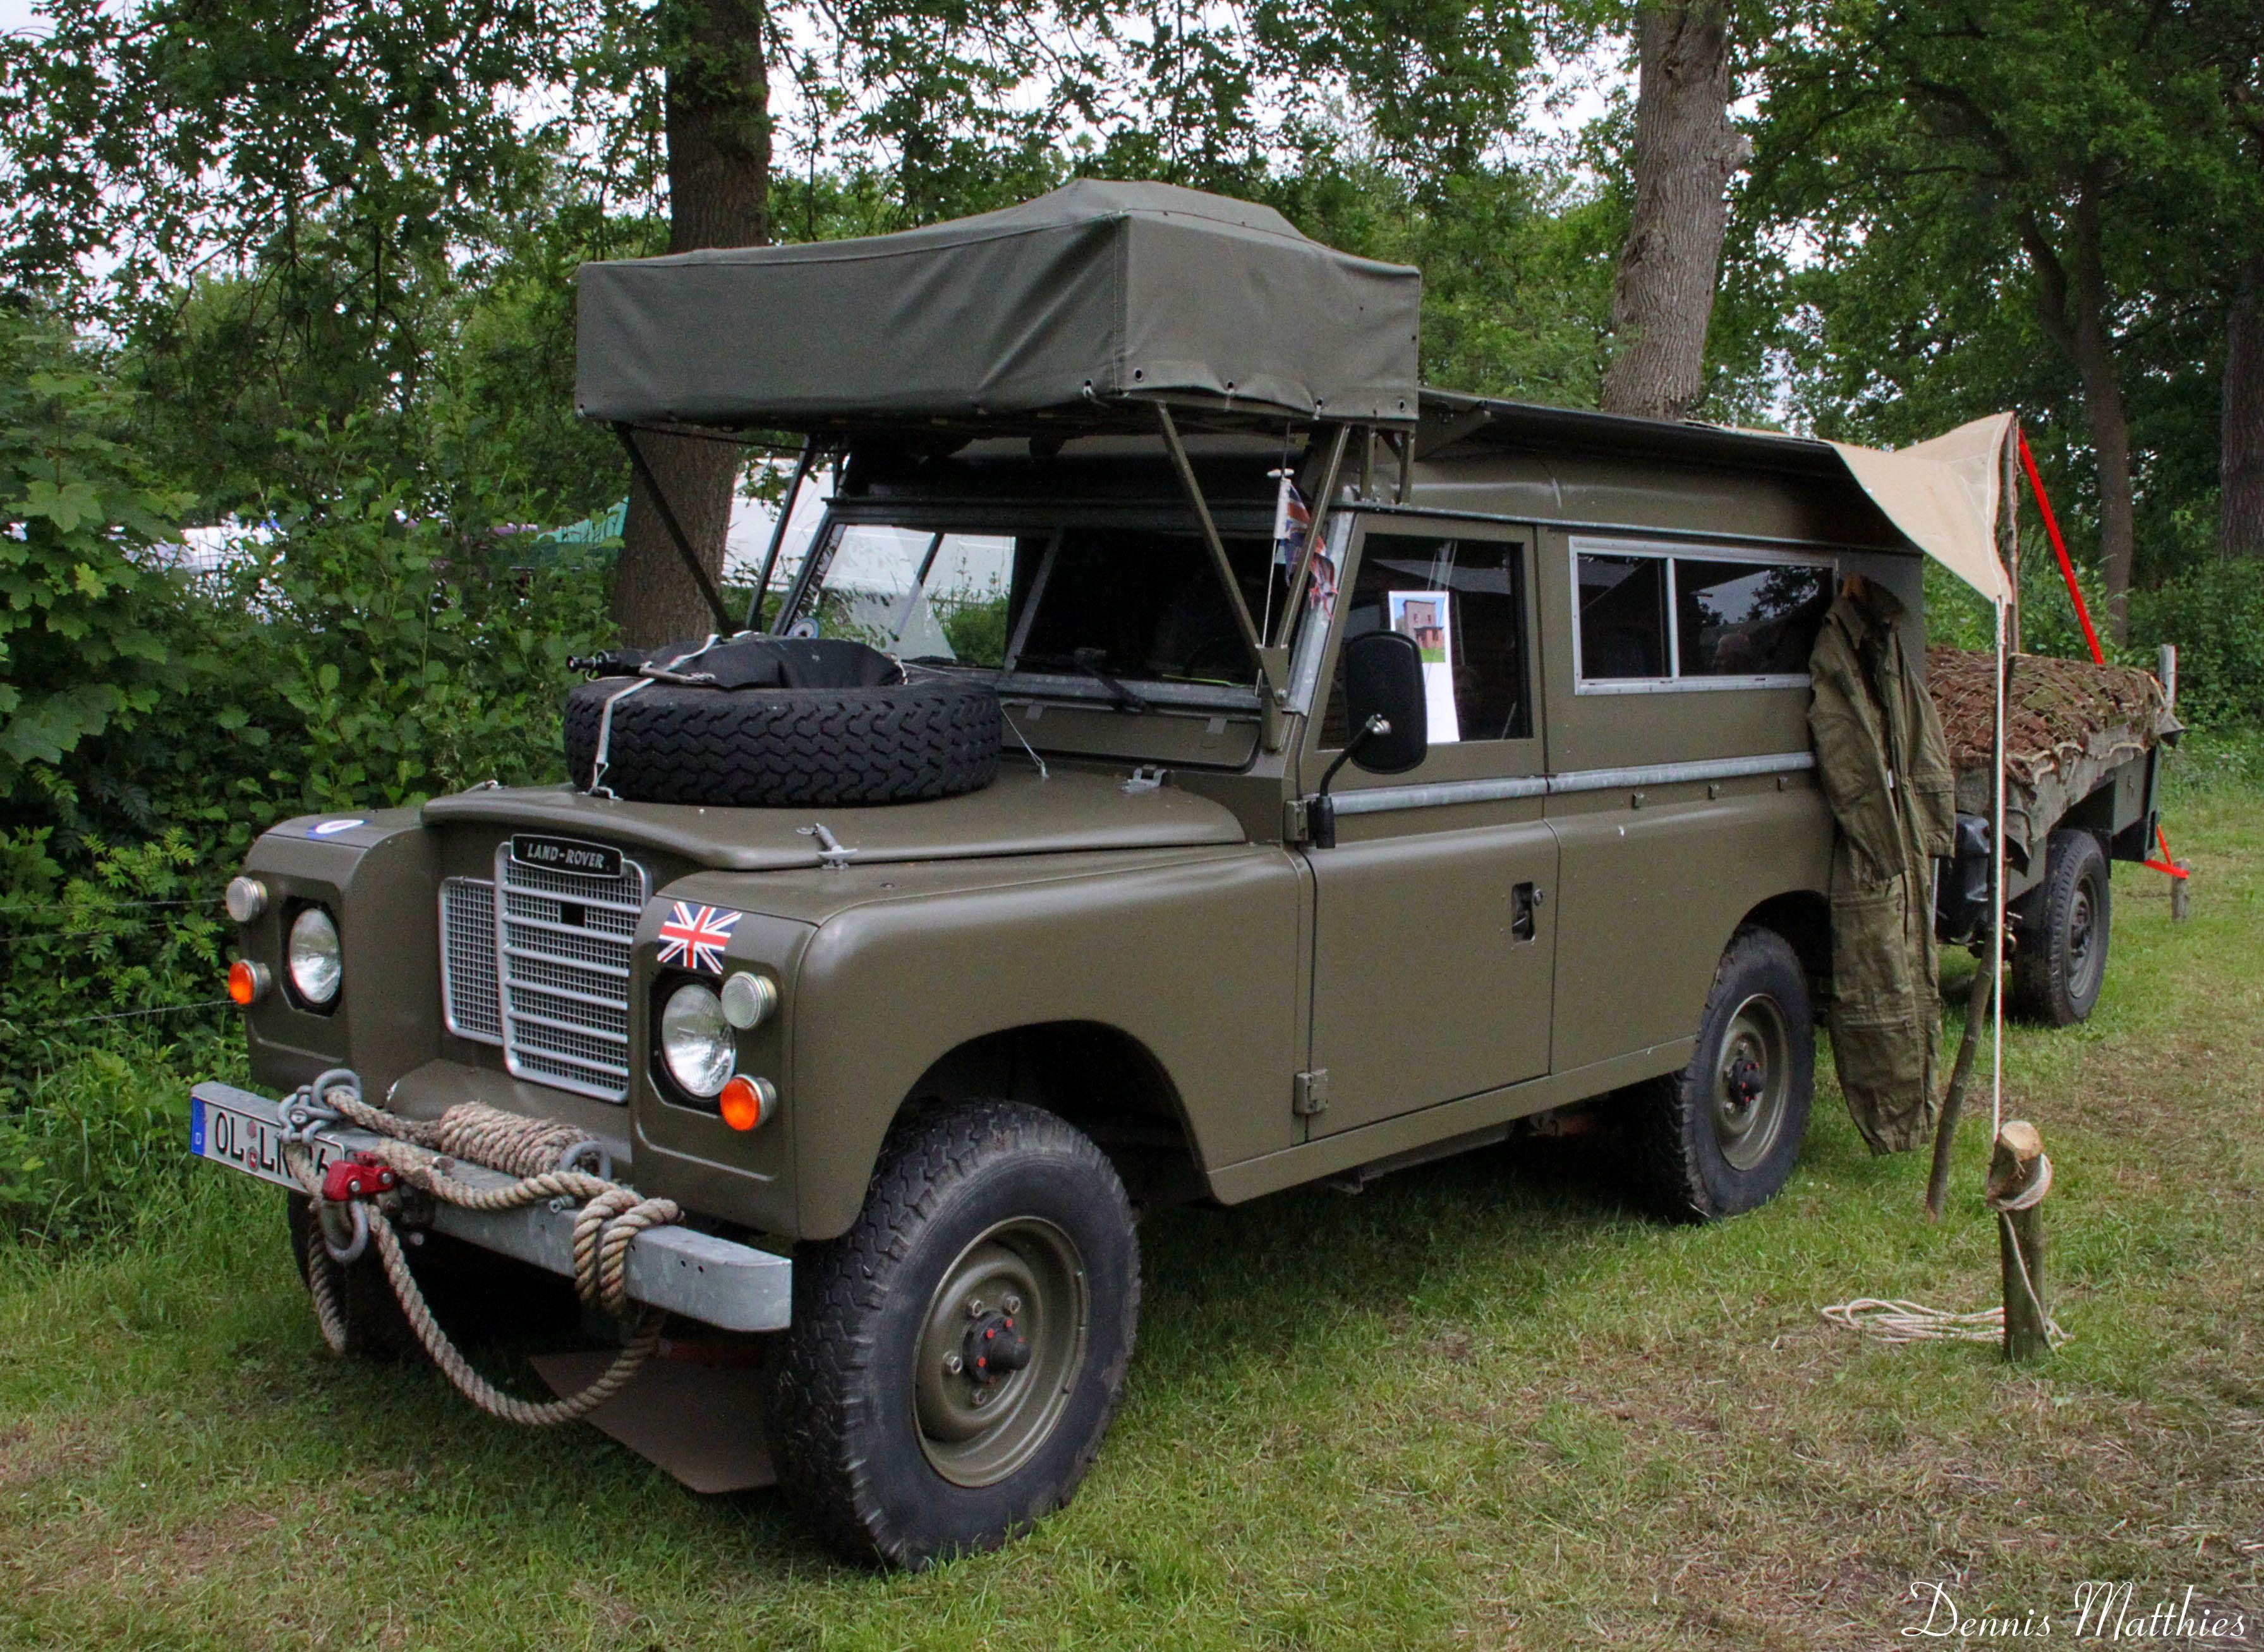 v vintage new landrover land edition defender heritage for comparison rover rovers old sale series